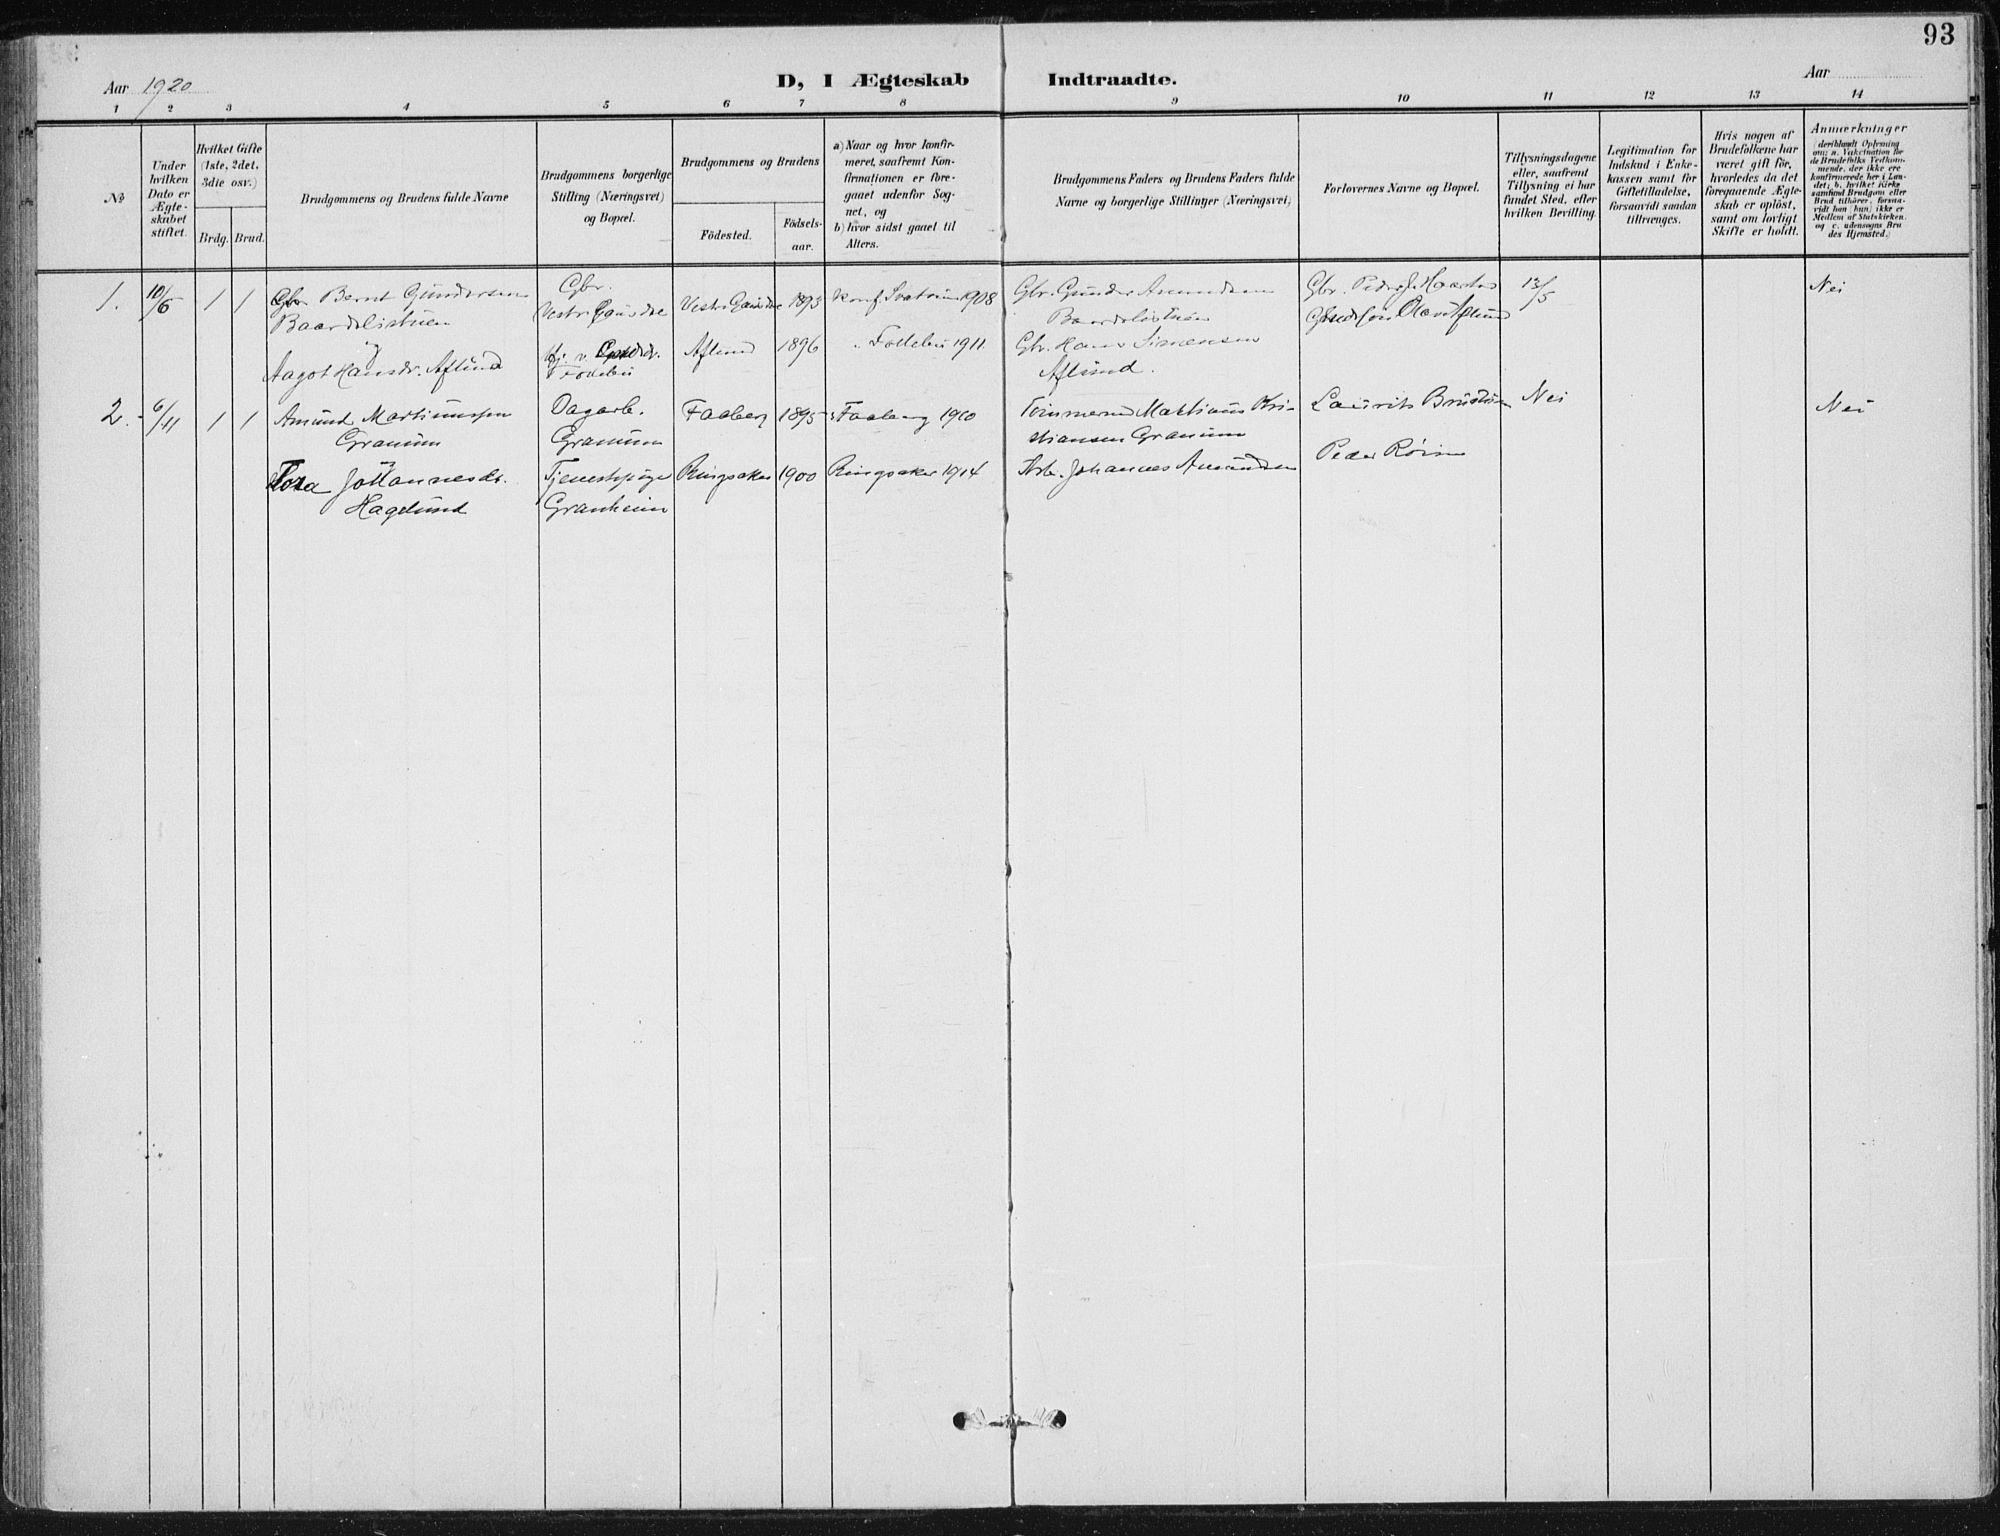 SAH, Østre Gausdal prestekontor, Ministerialbok nr. 5, 1902-1920, s. 93